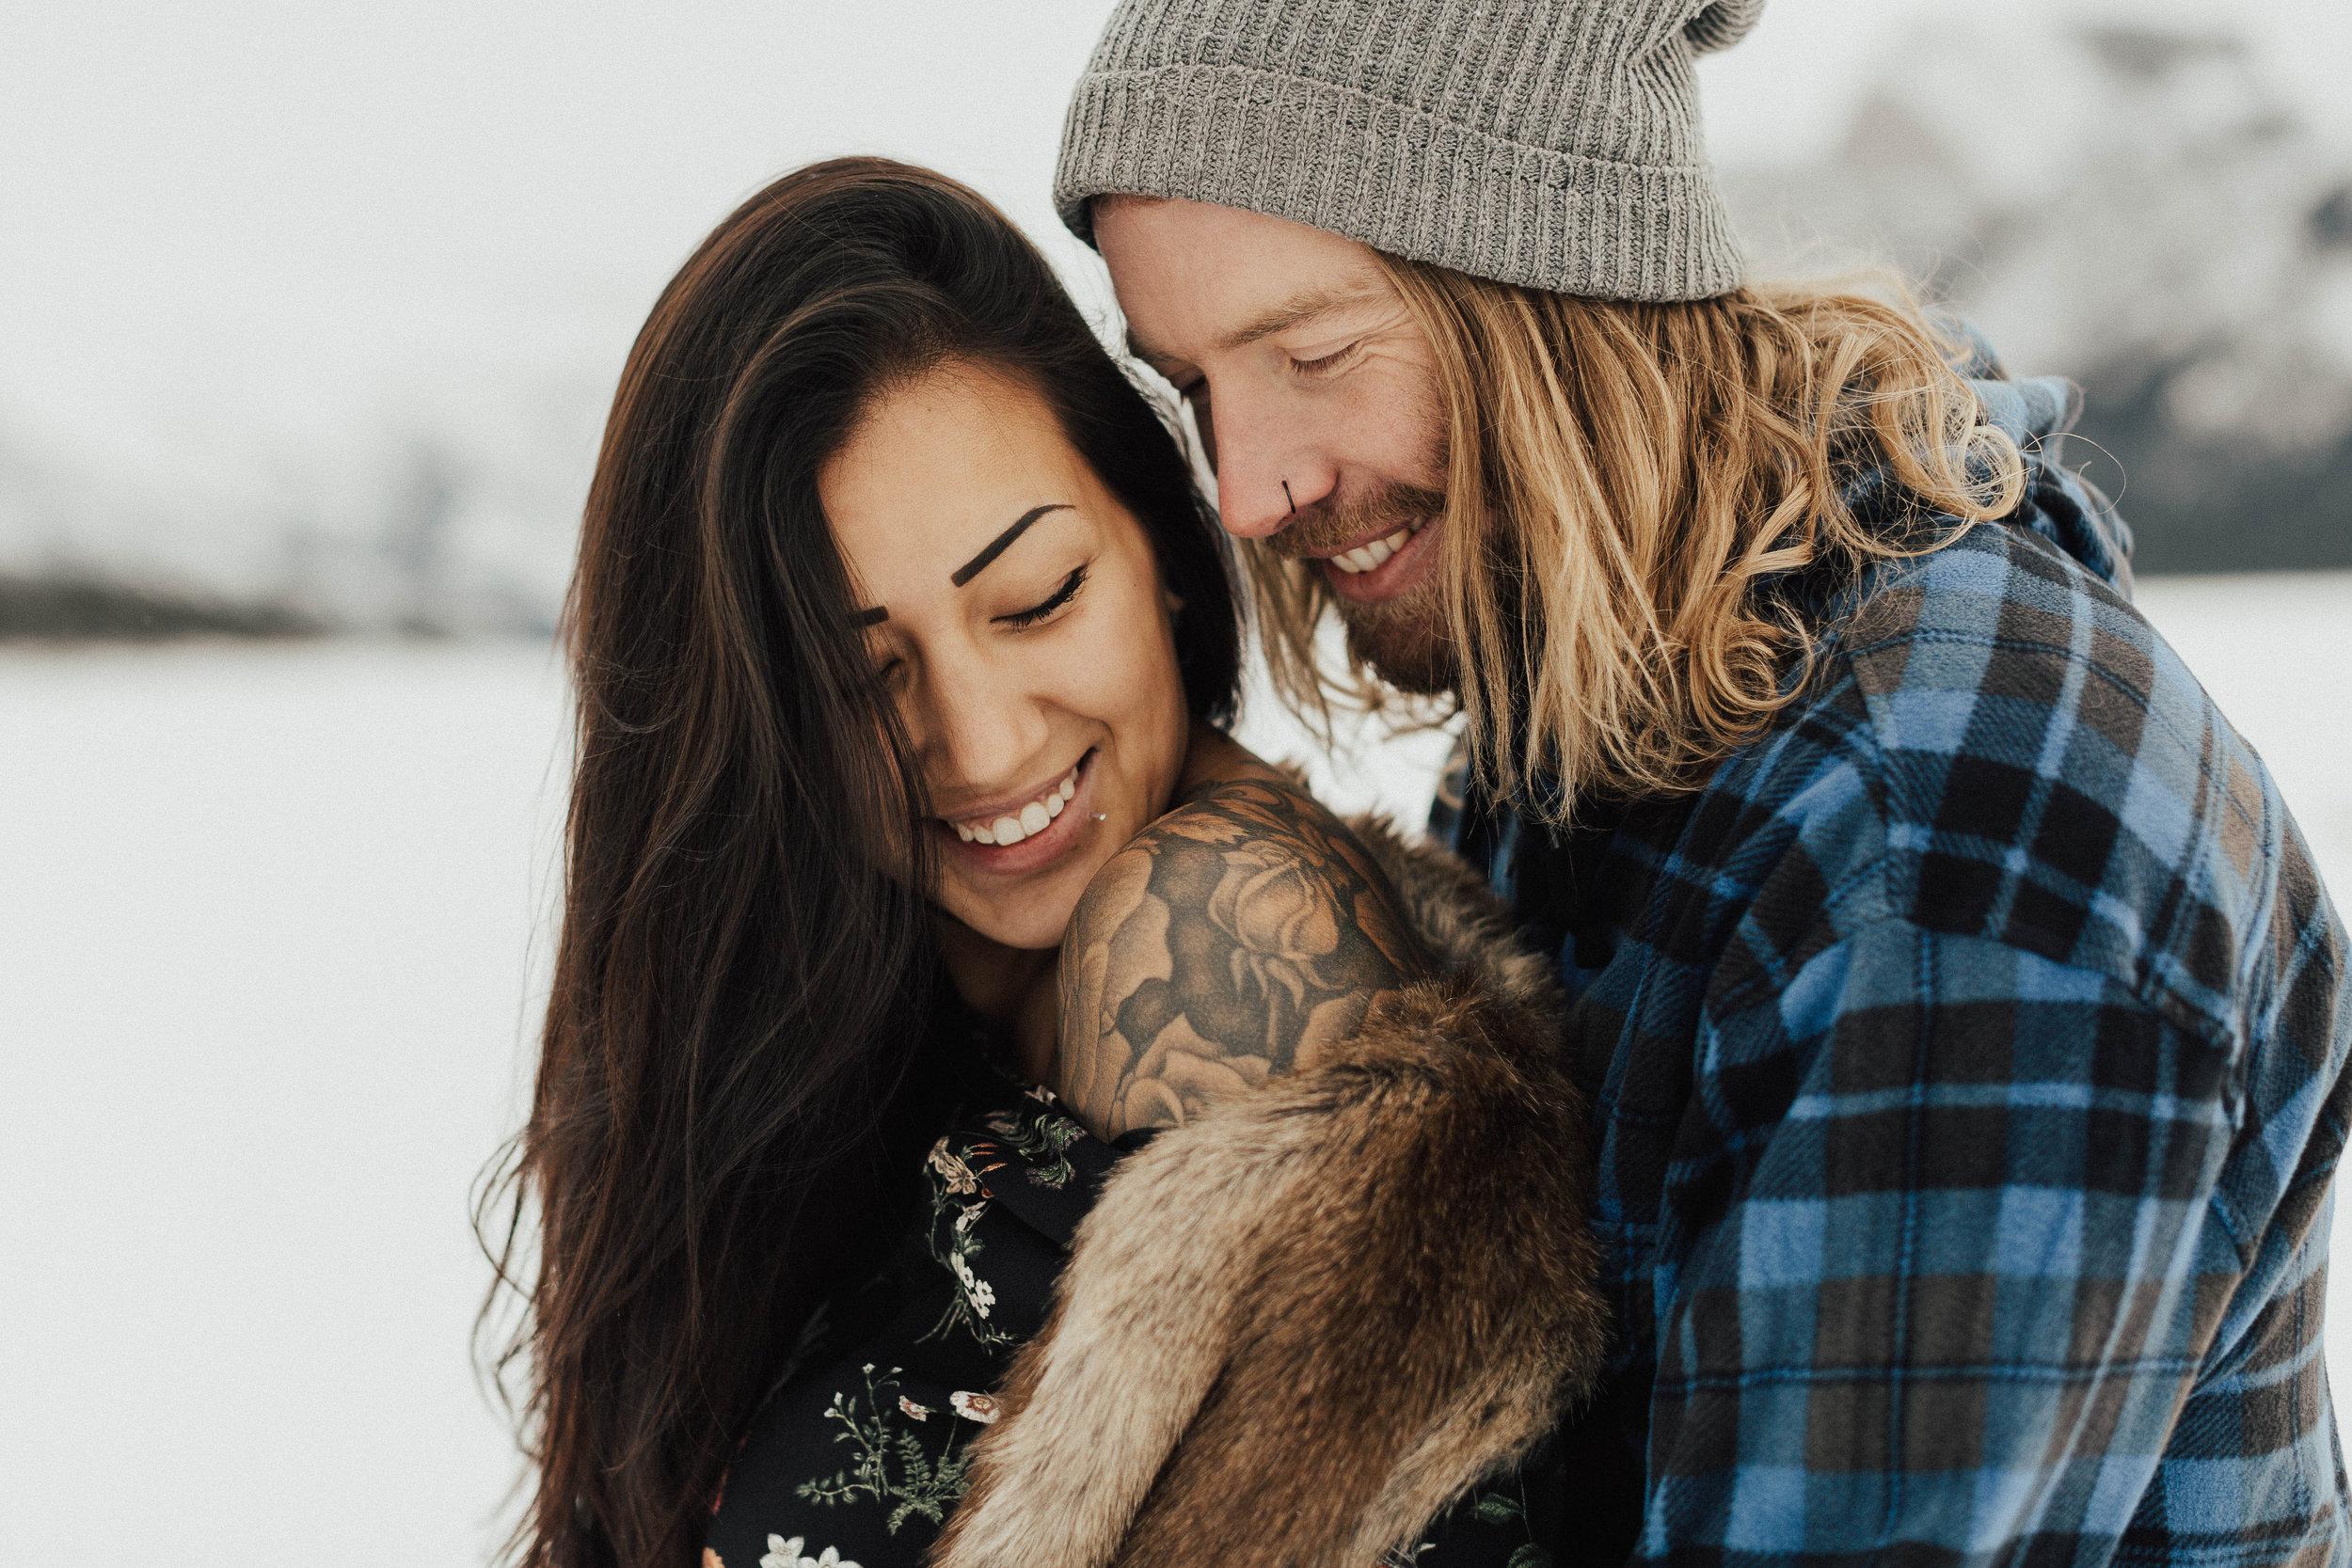 Banff Engagement Photographer - Winter Mountain Adventure Engagement Session - Michelle Larmand Photography-052